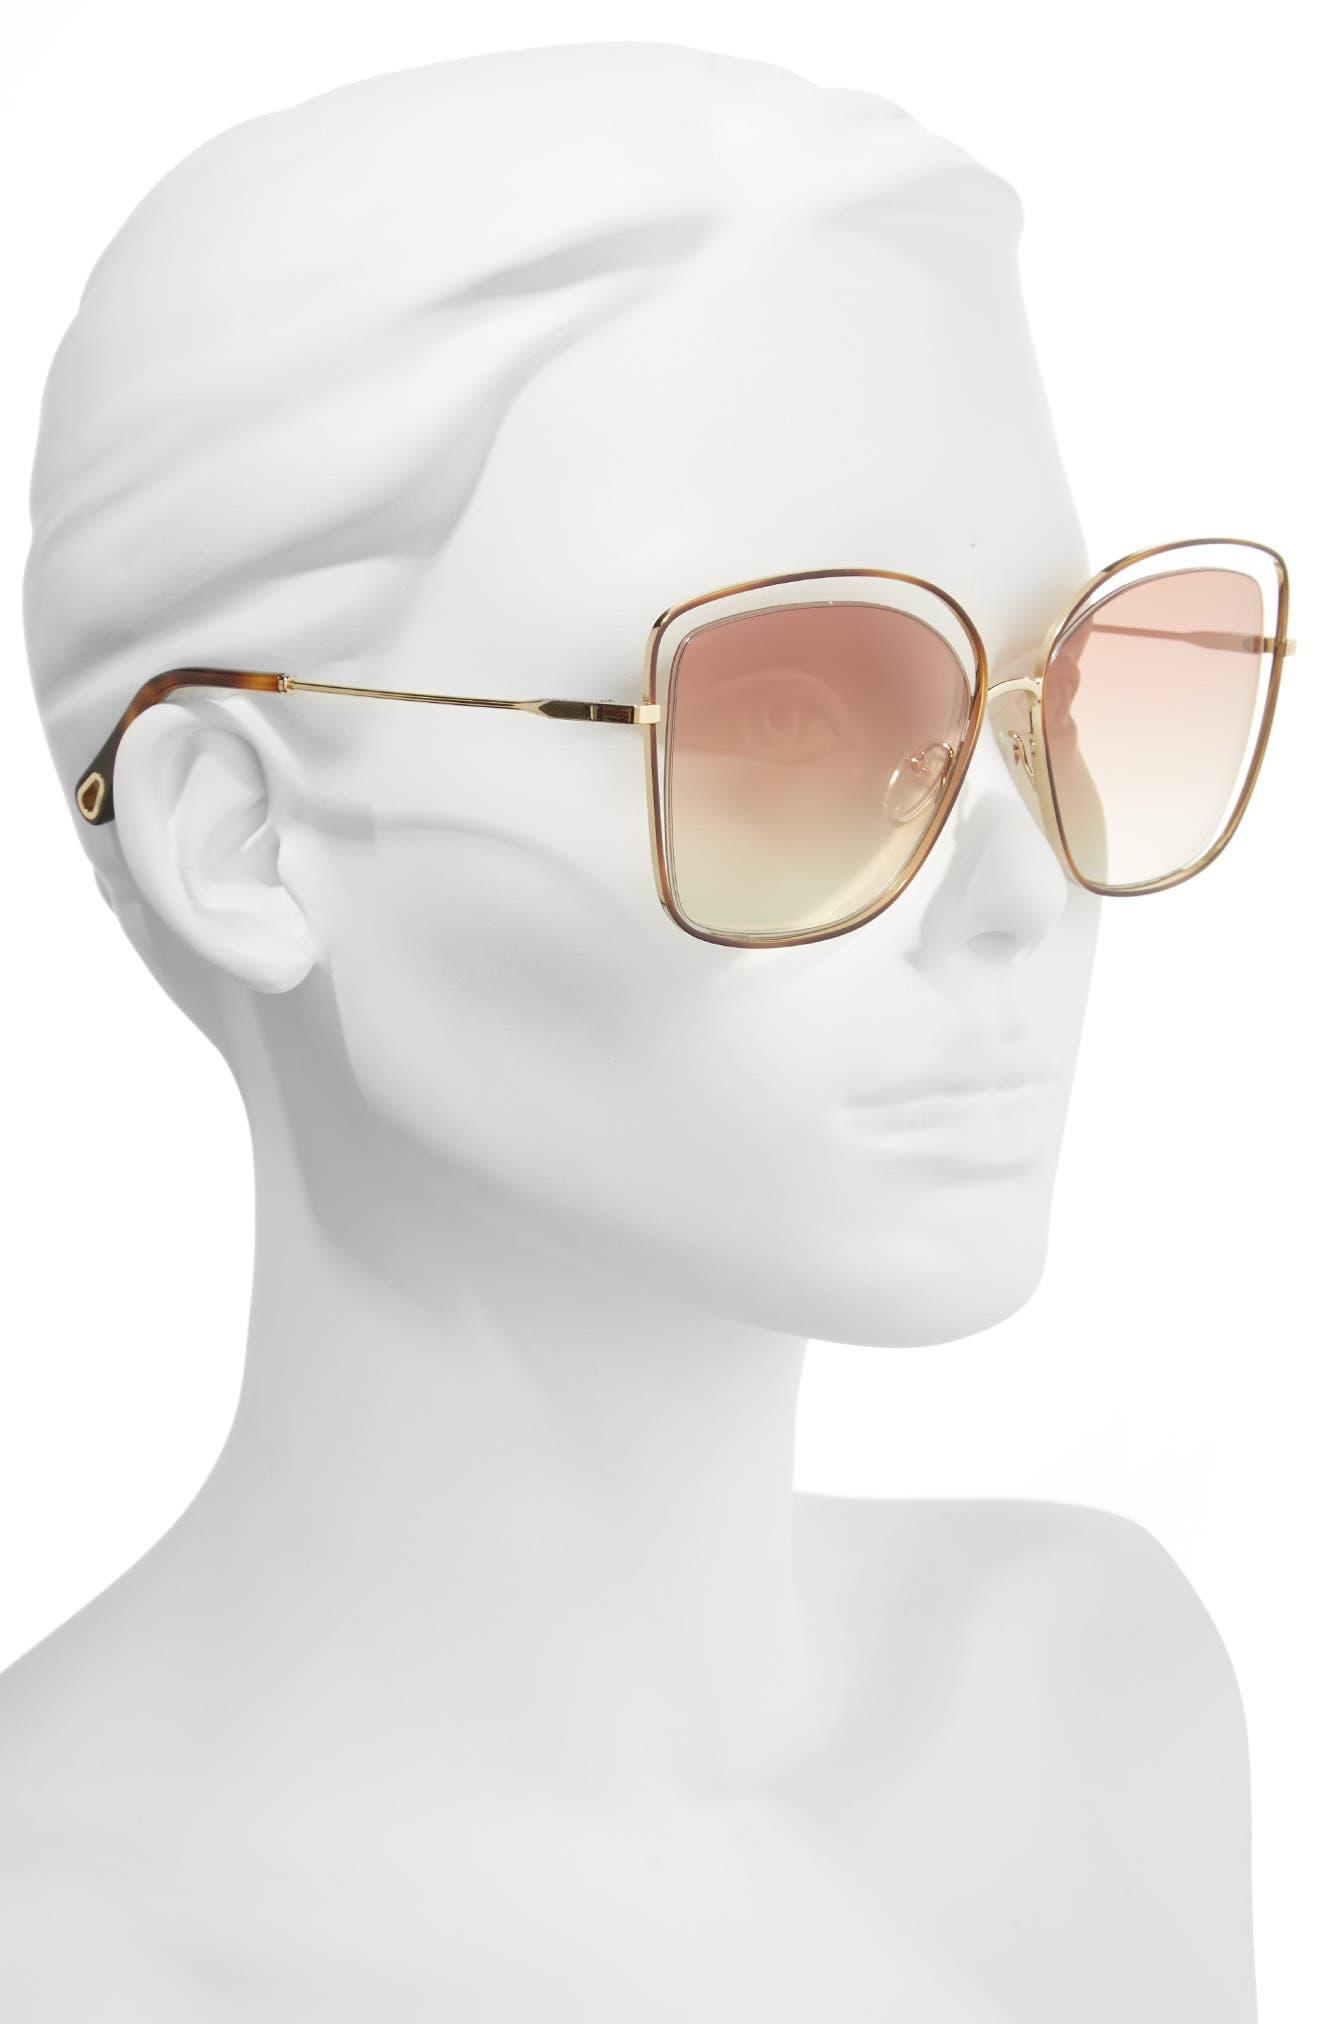 60mm Halo Frame Sunglasses,                             Alternate thumbnail 2, color,                             Havana/ Bronze